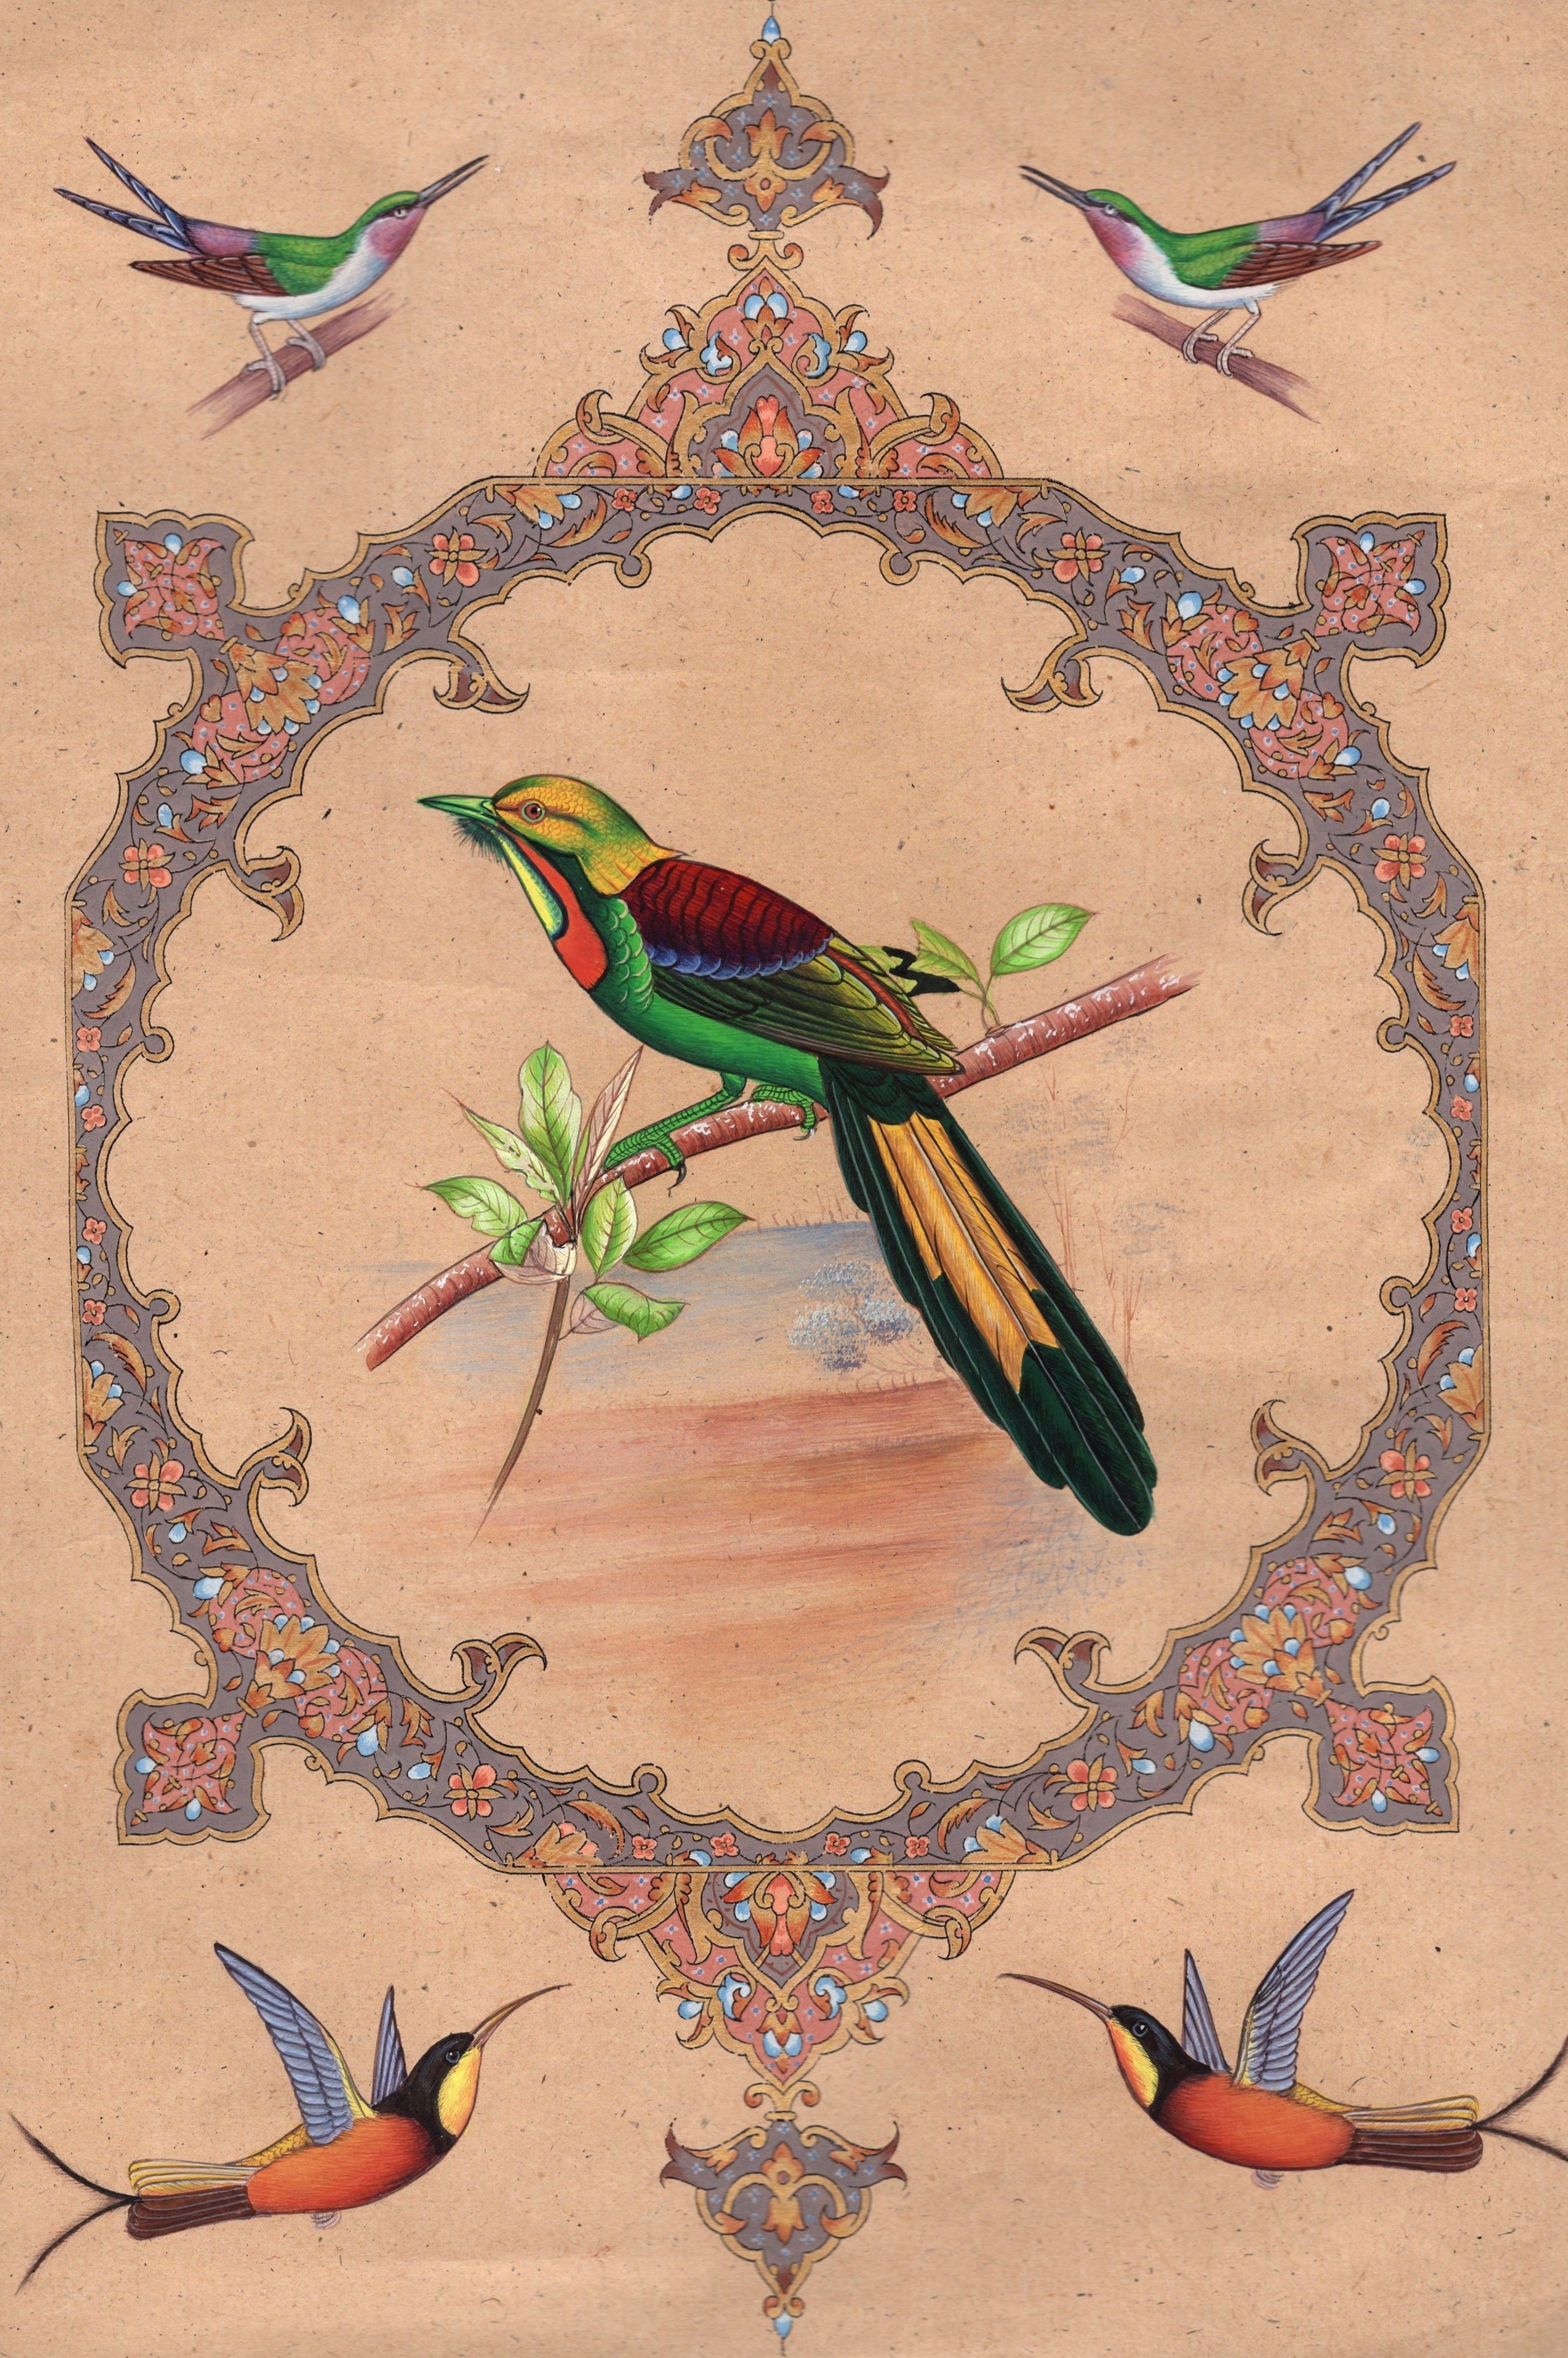 Islamic Floral Motif Bird Painting Handmade Miniature Decor Nature Ethnic Art